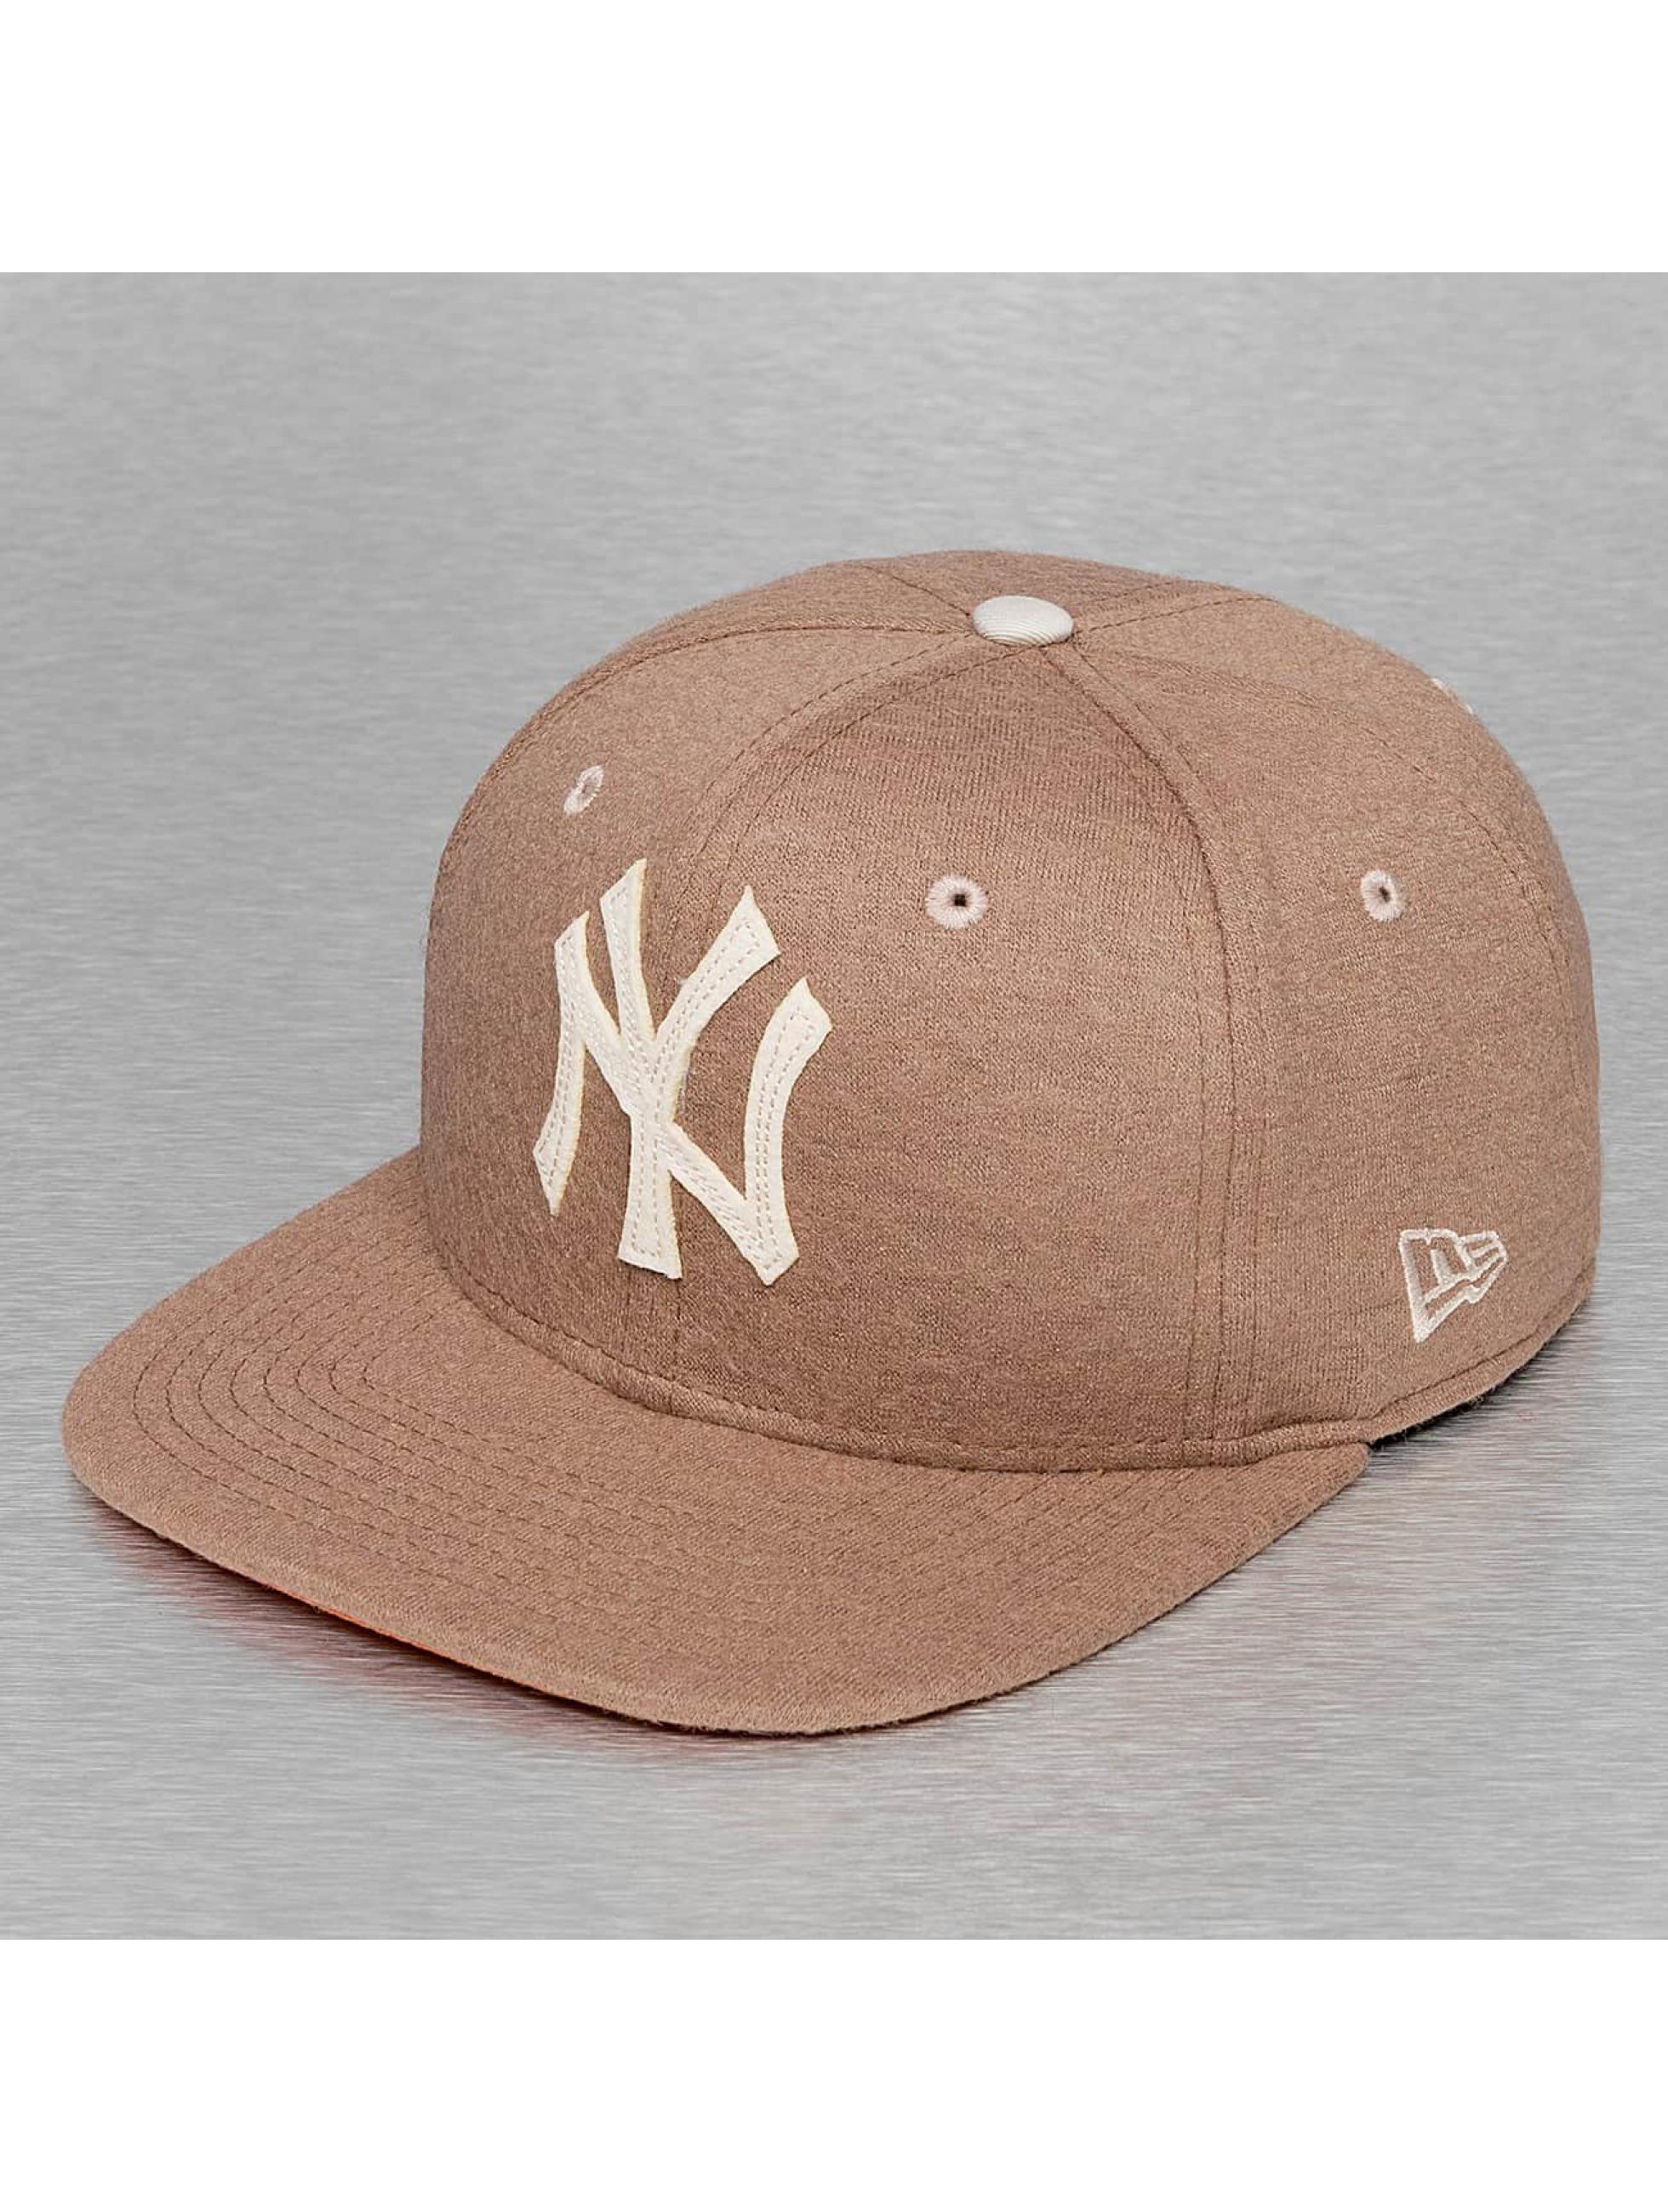 New Era Casquette Snapback & Strapback Felt Wool NY Yankees brun